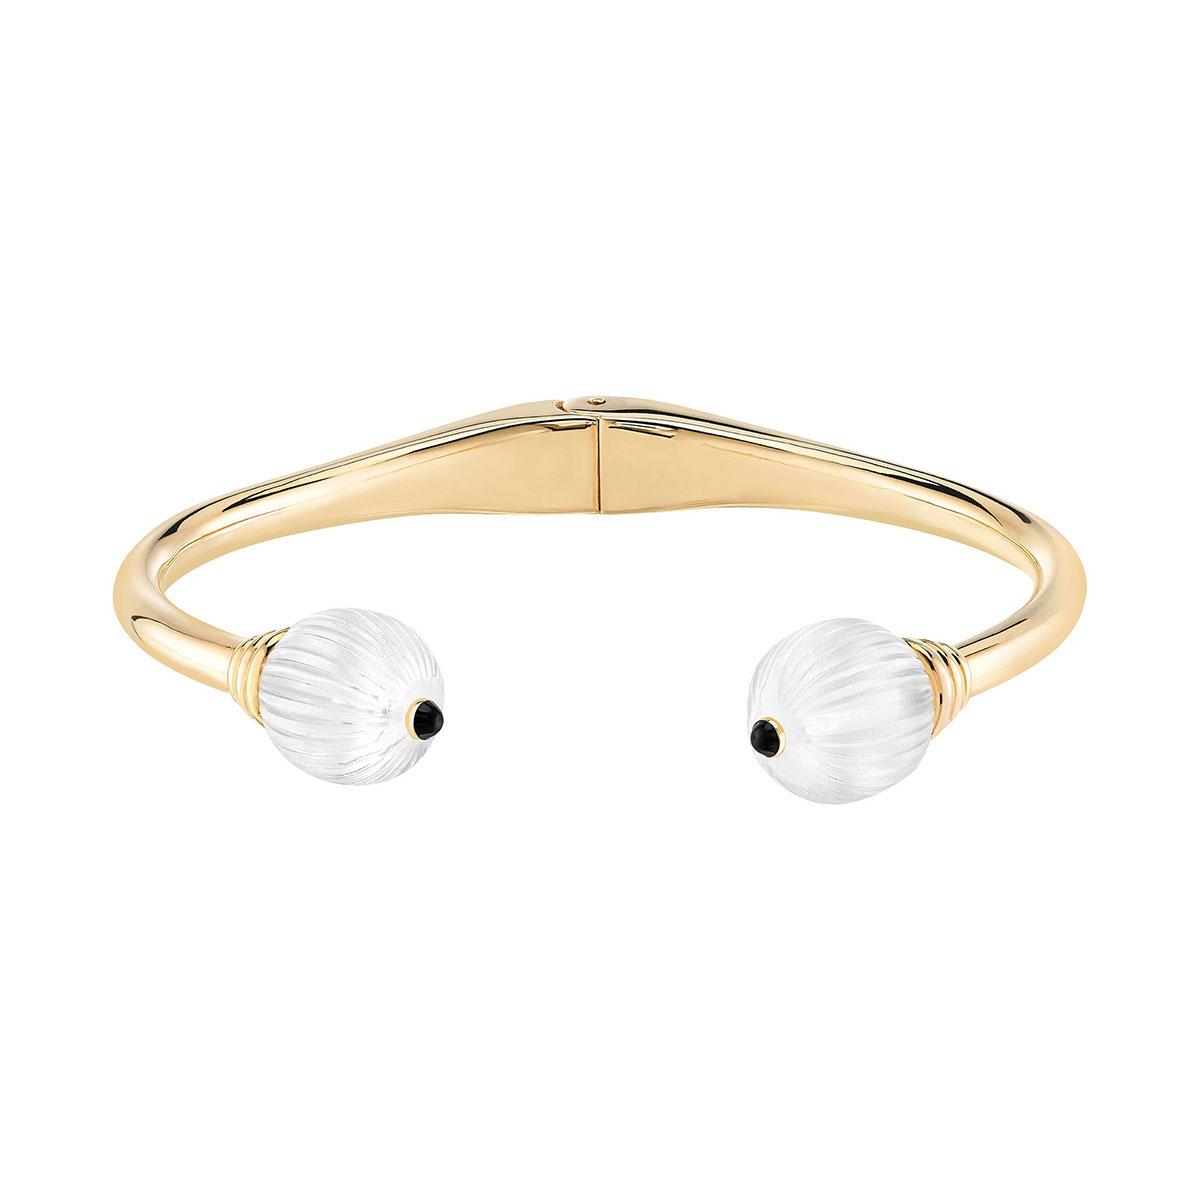 Lalique and Sterling Silver Vibrante Bangle Bracelet, Gold Vermeil